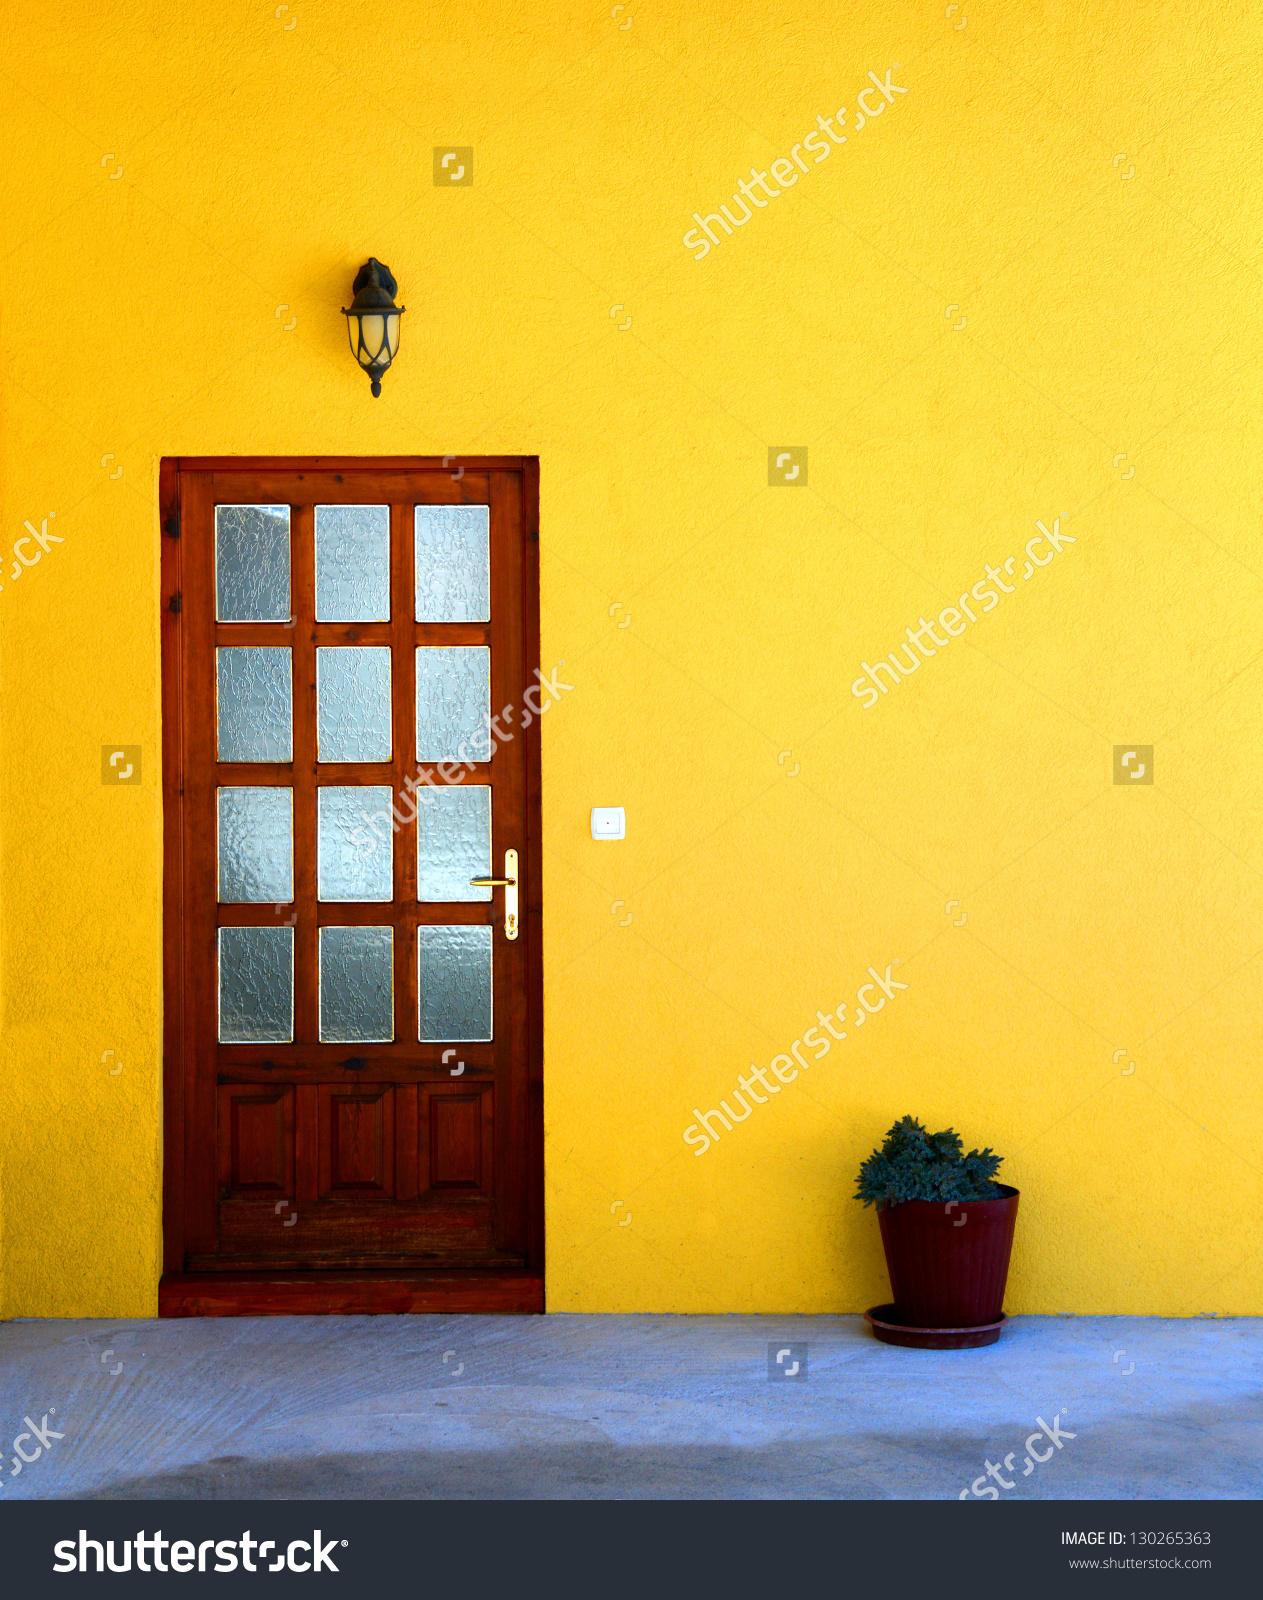 Yellow House Wall Door Flower Pot Stock Photo 130265363.